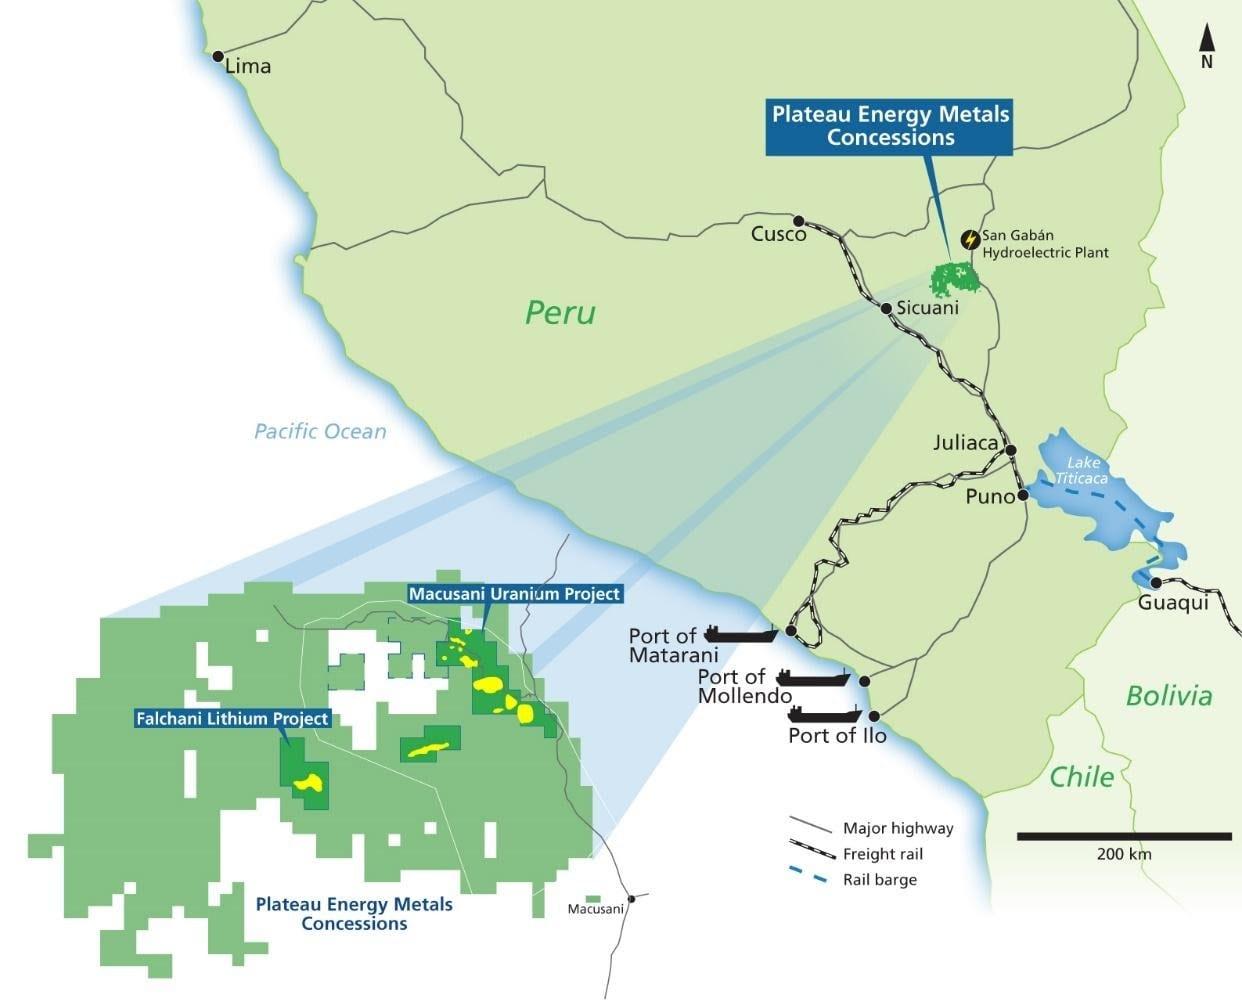 plateau energy metals concessions